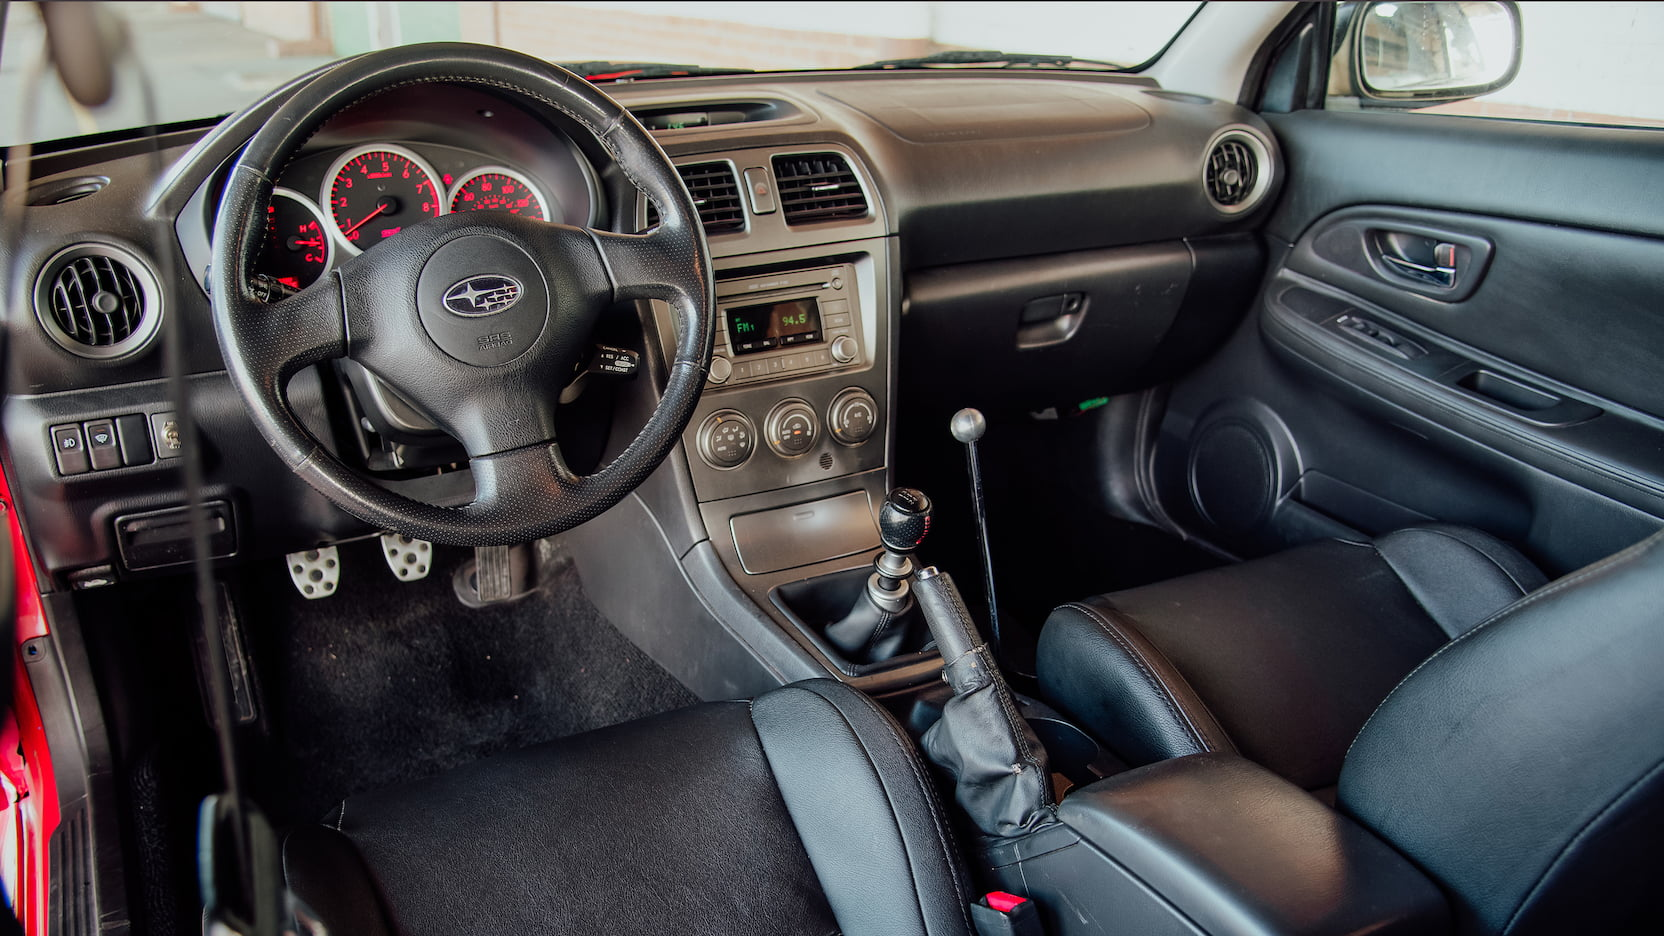 2006 Subaru WRX coupe interior